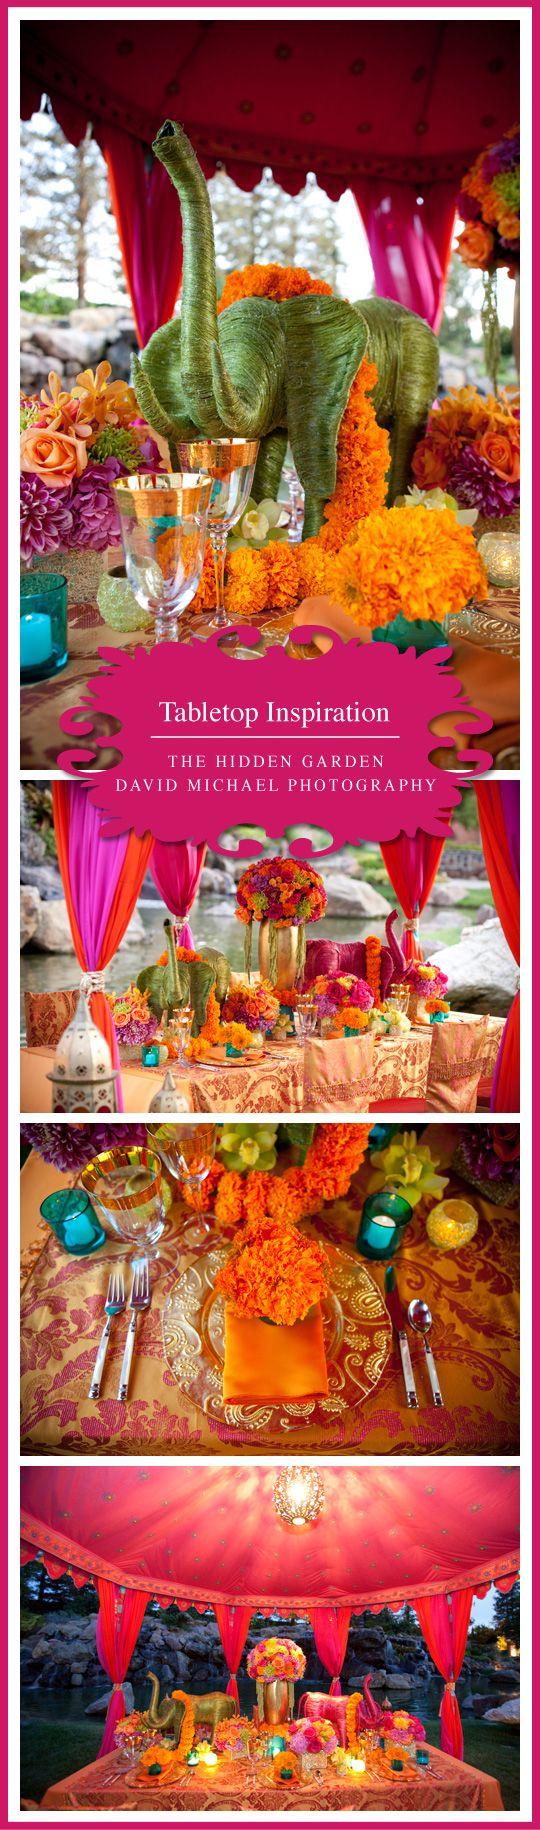 Tabletop Inspiration | Indian Elegance www.tablescapesbydesign.com https://www.facebook.com/pages/Tablescapes-By-Design/129811416695